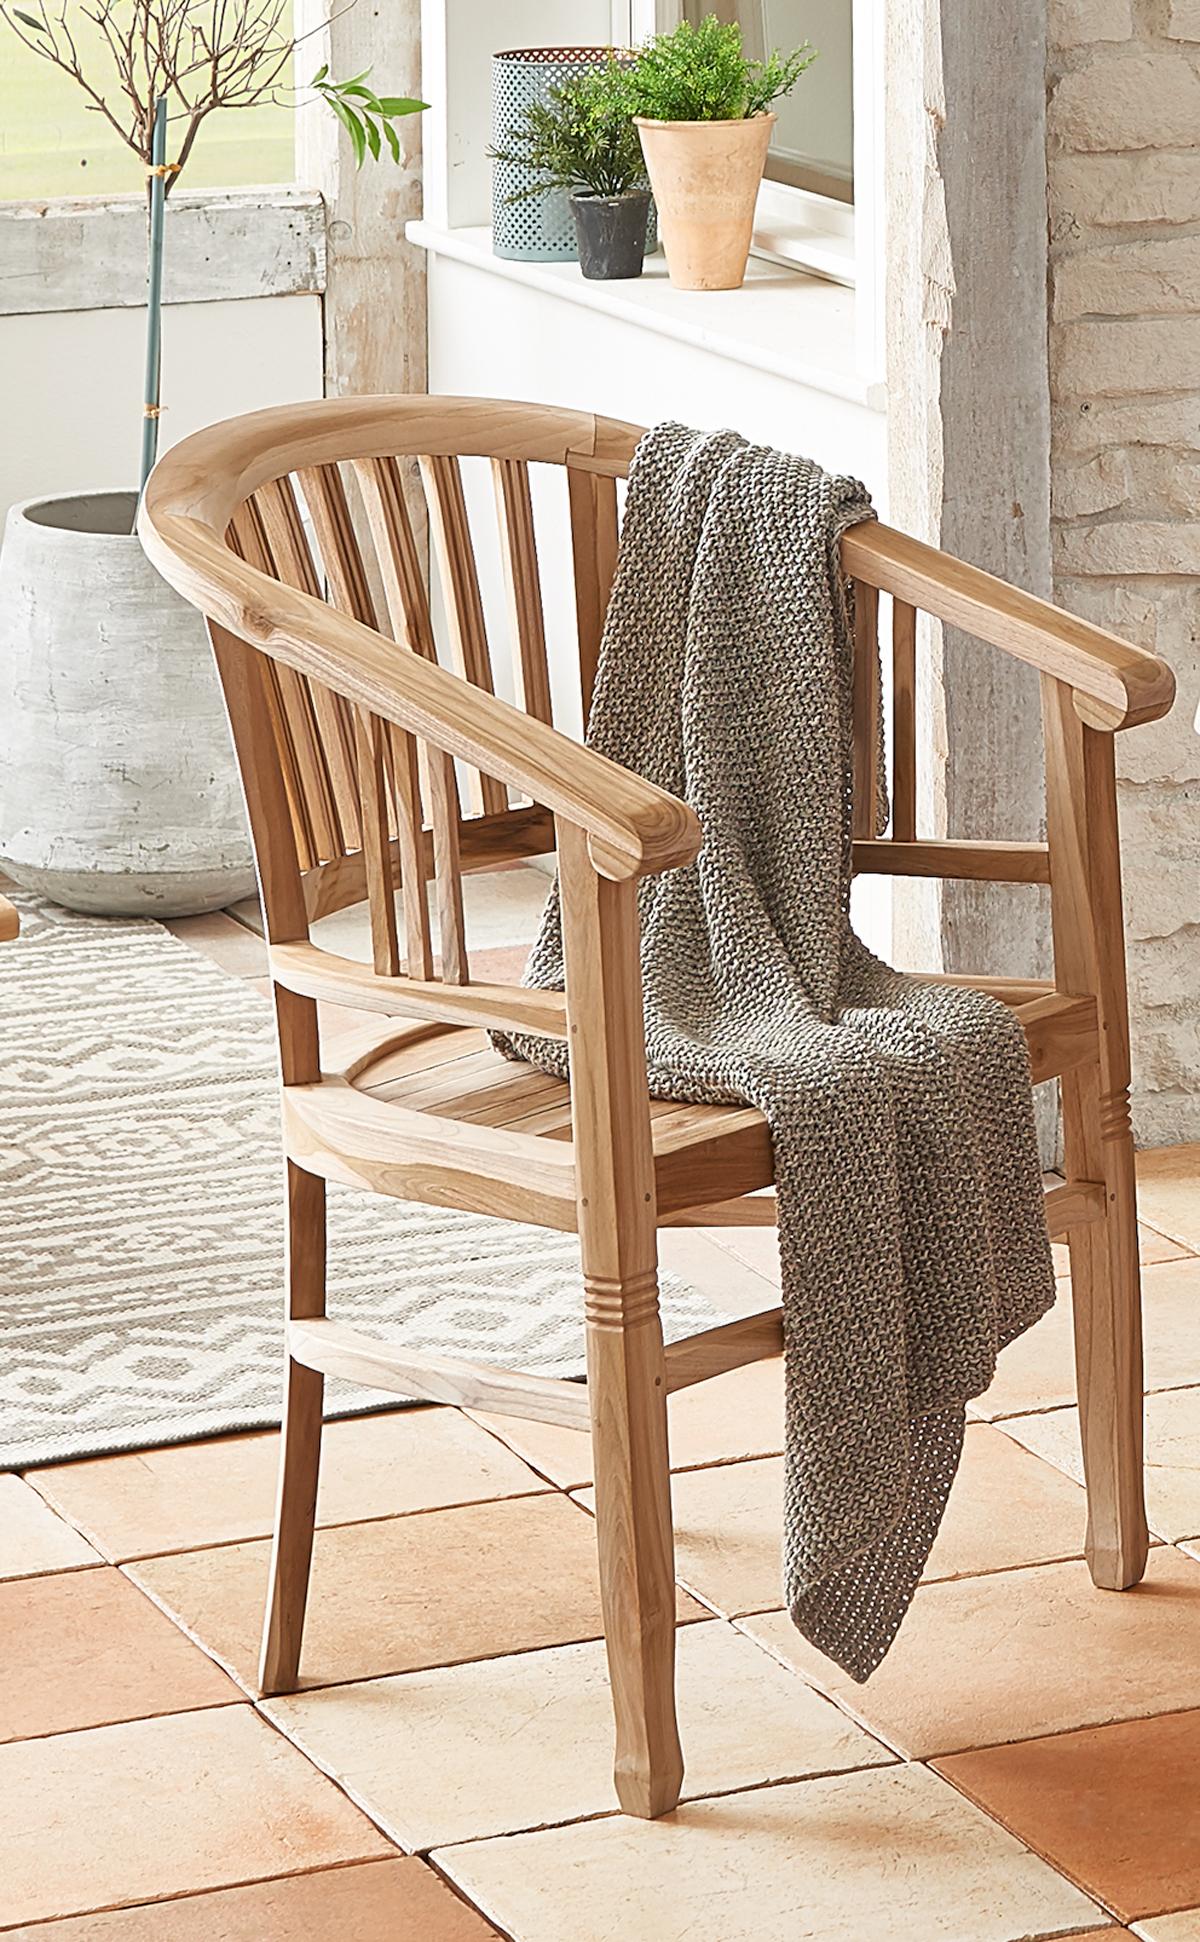 sam teak gartensessel gartenstuhl mit armlehnen moreno. Black Bedroom Furniture Sets. Home Design Ideas